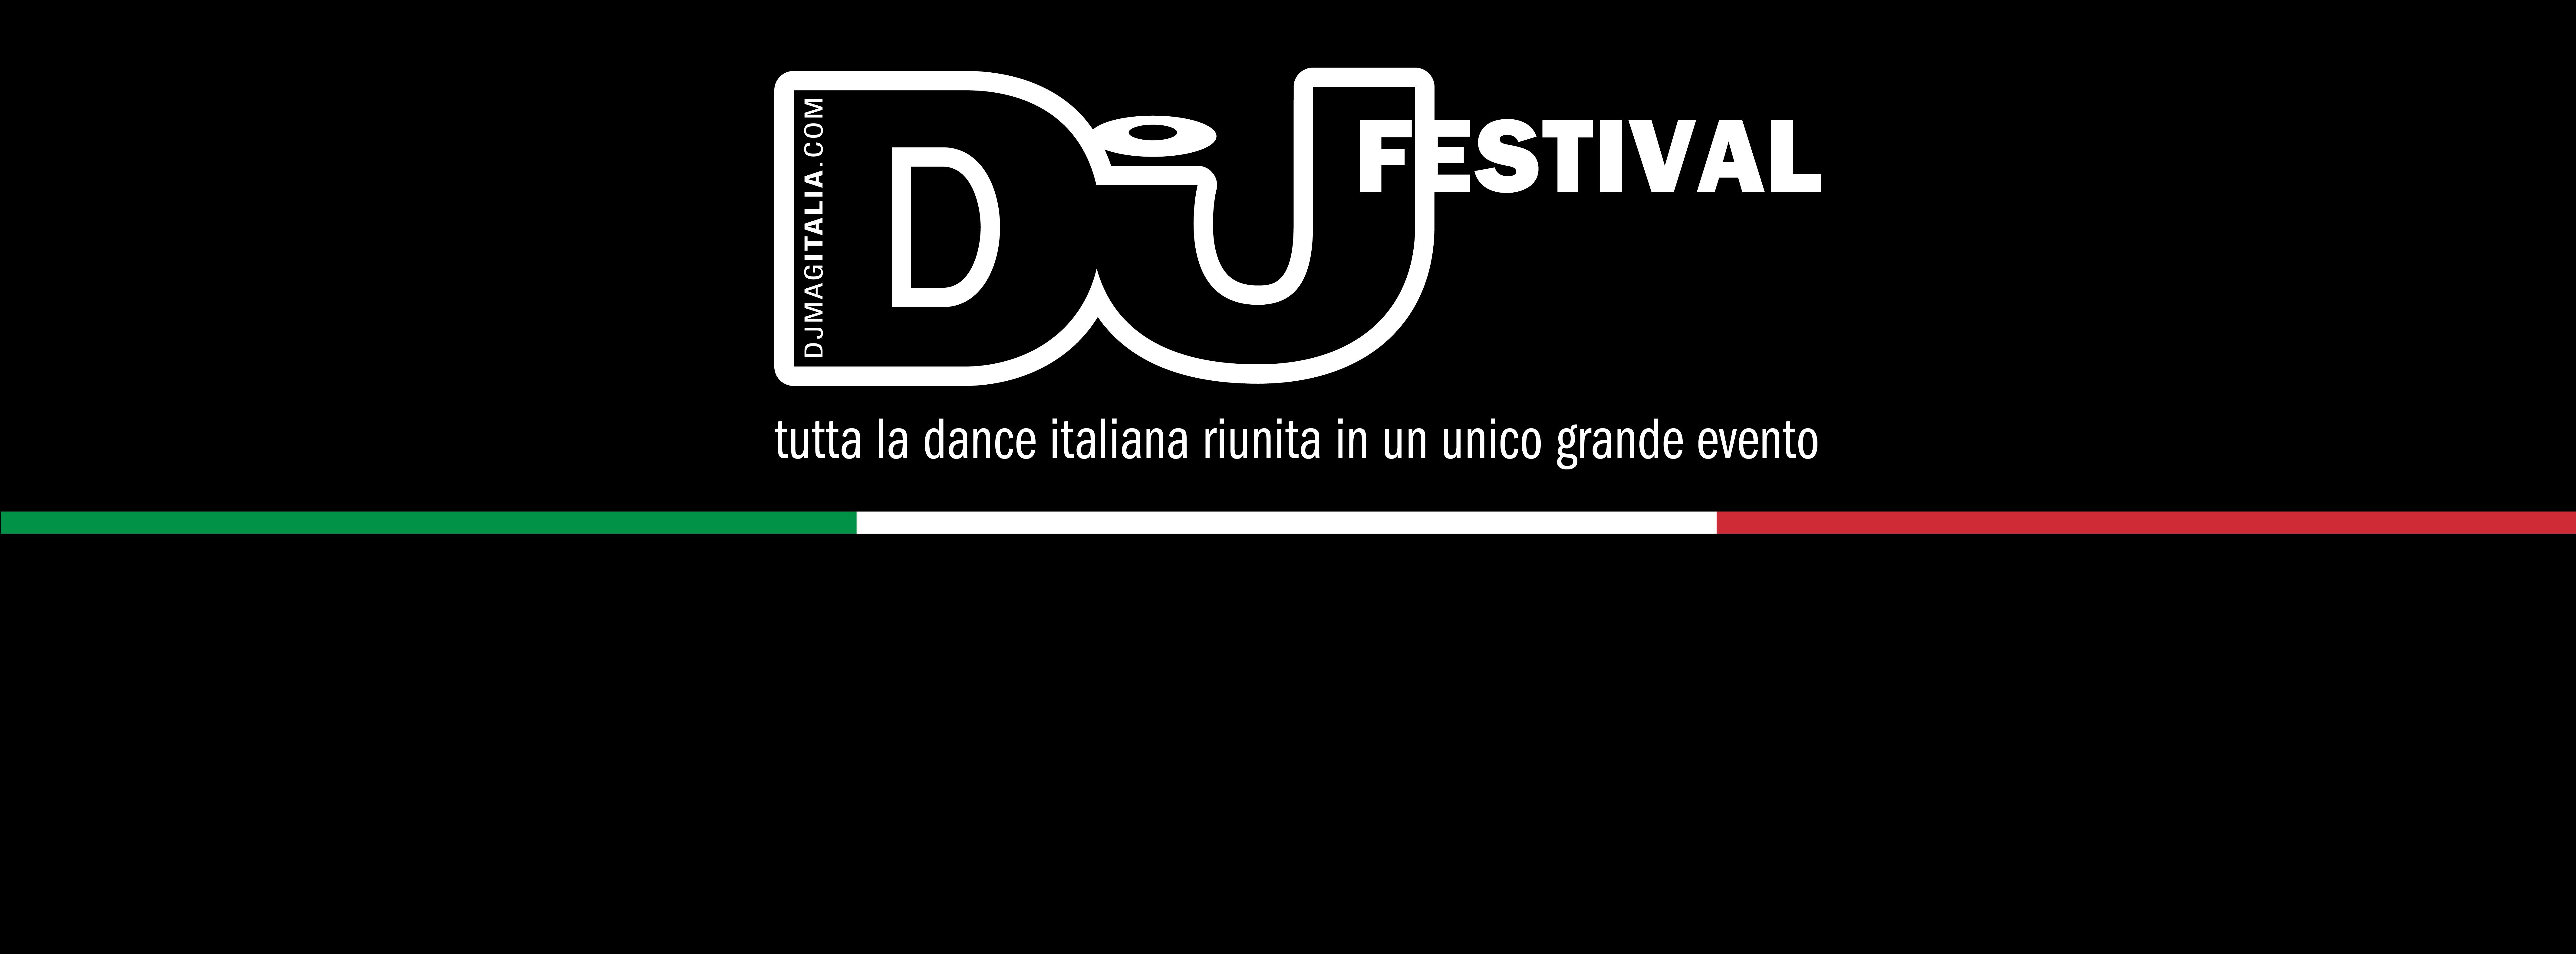 djmag festival